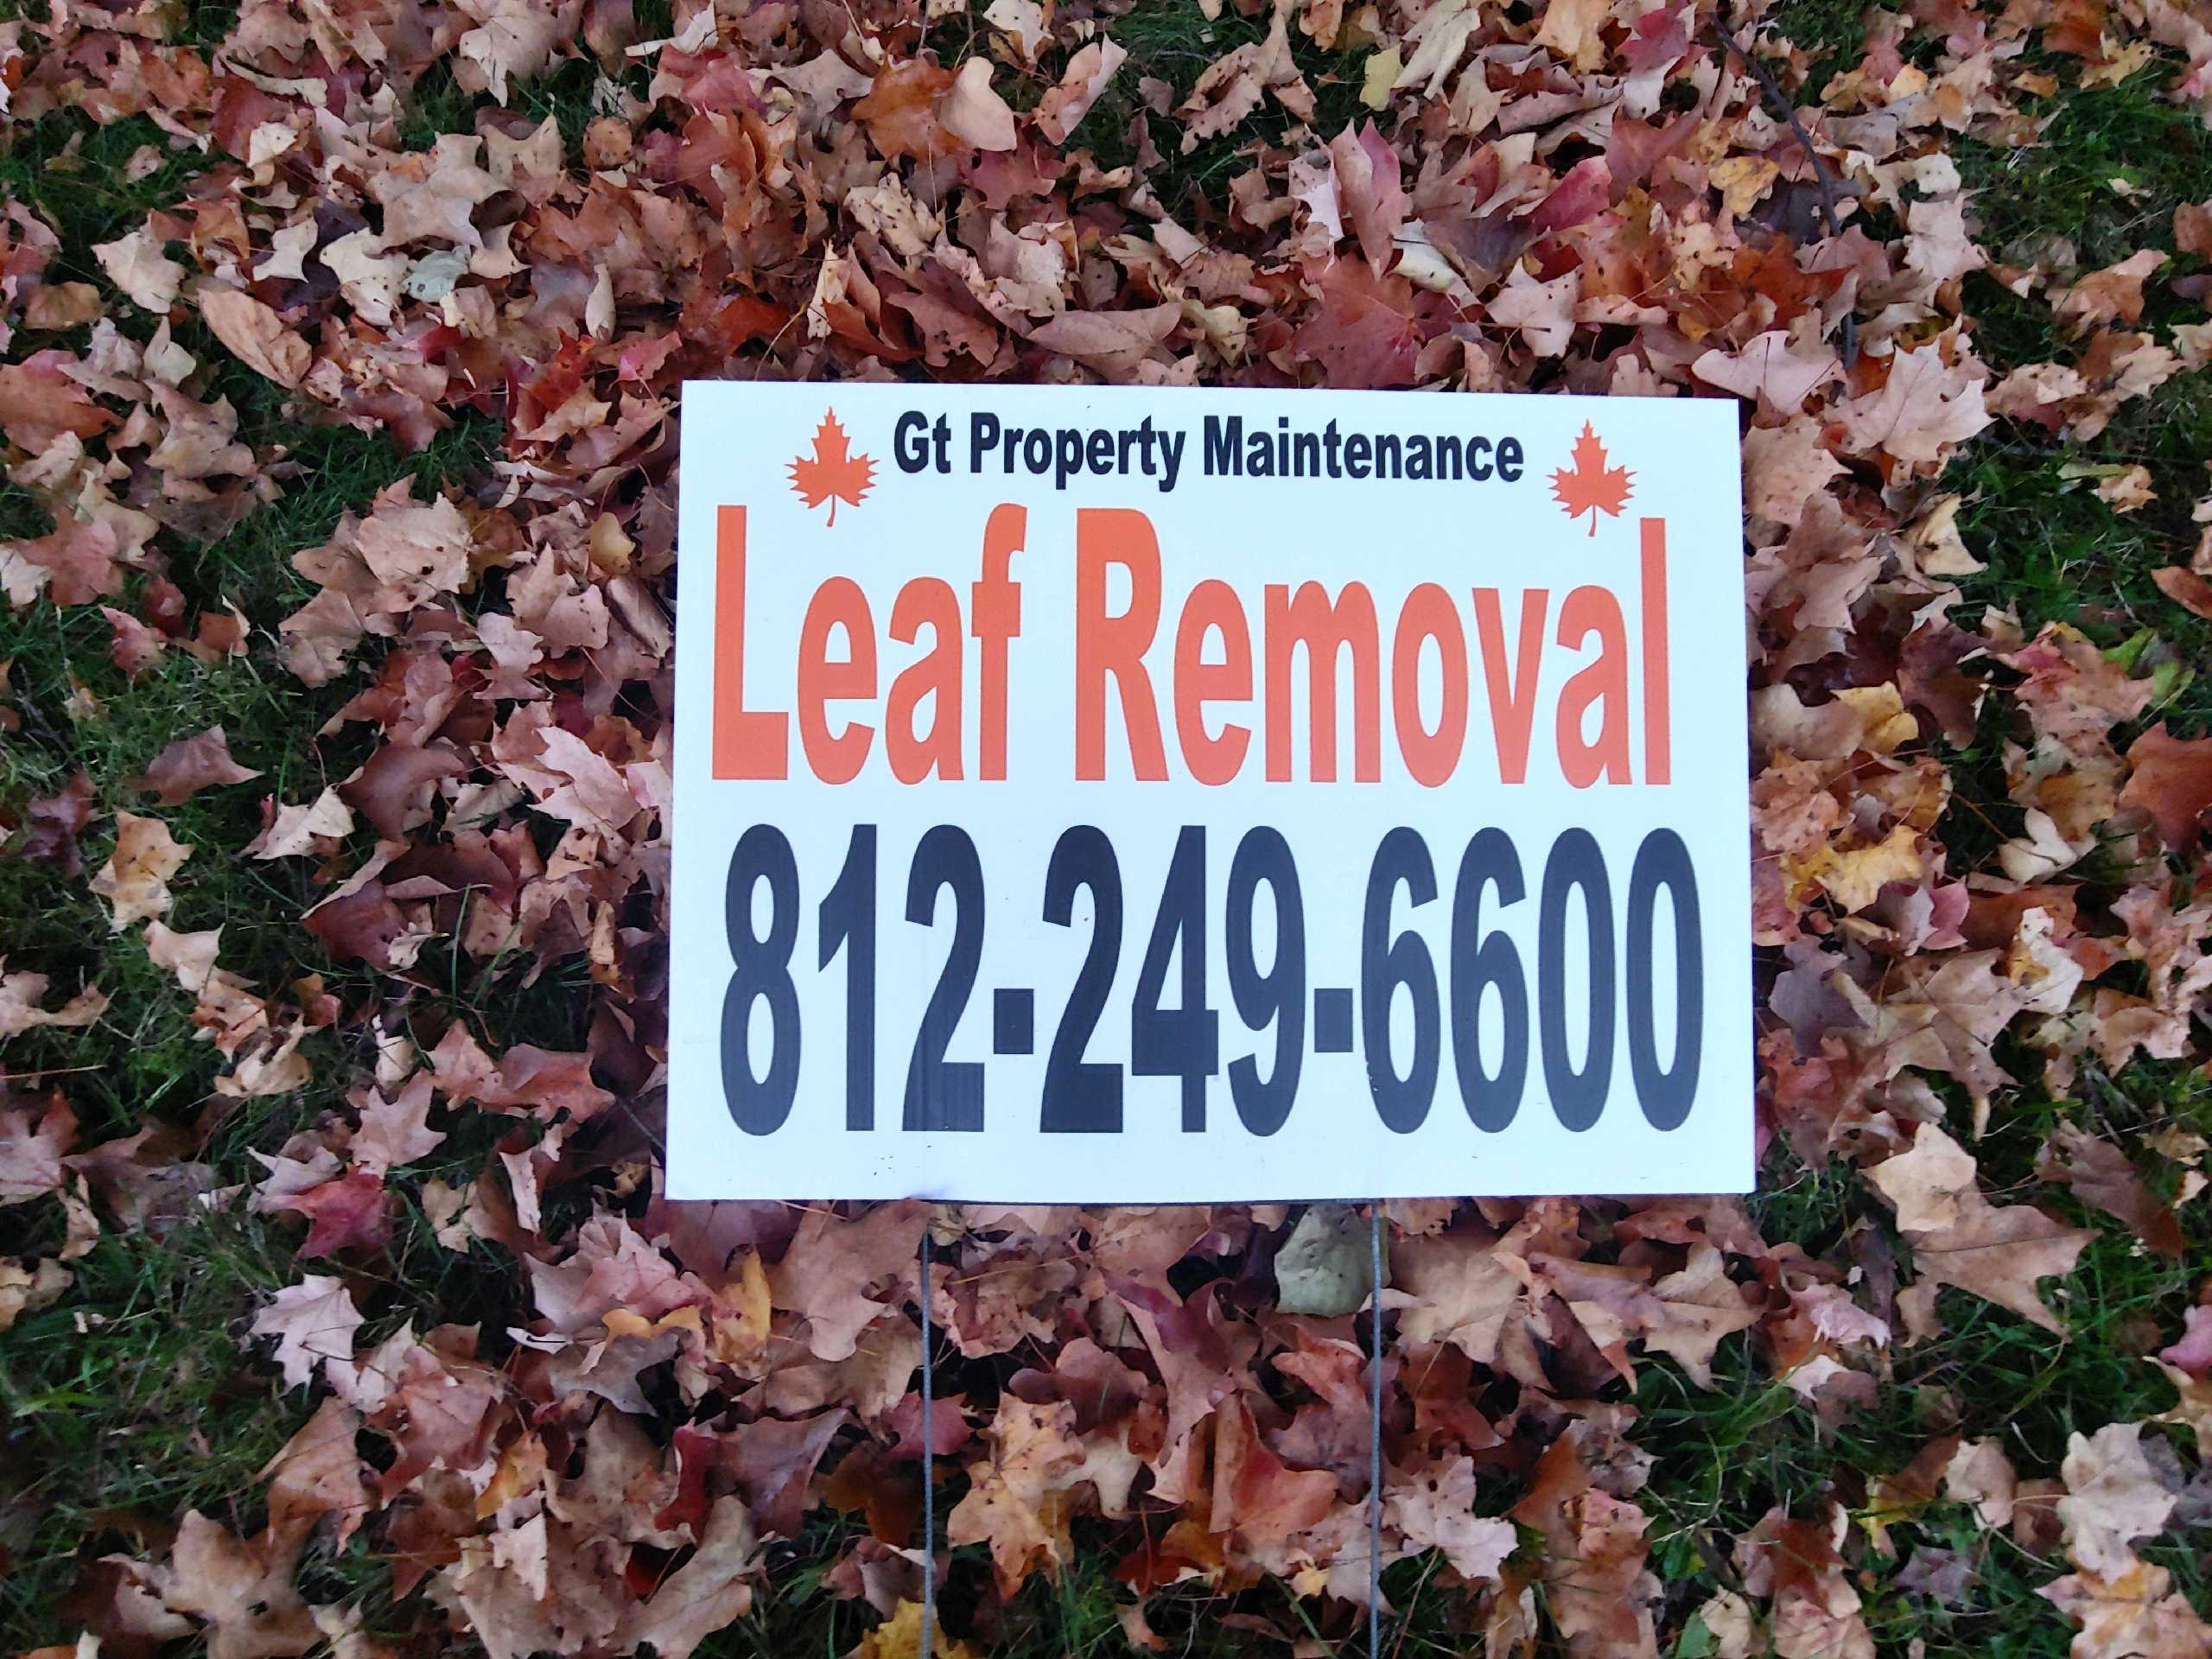 grant leaf sign 1104191701a.jpg